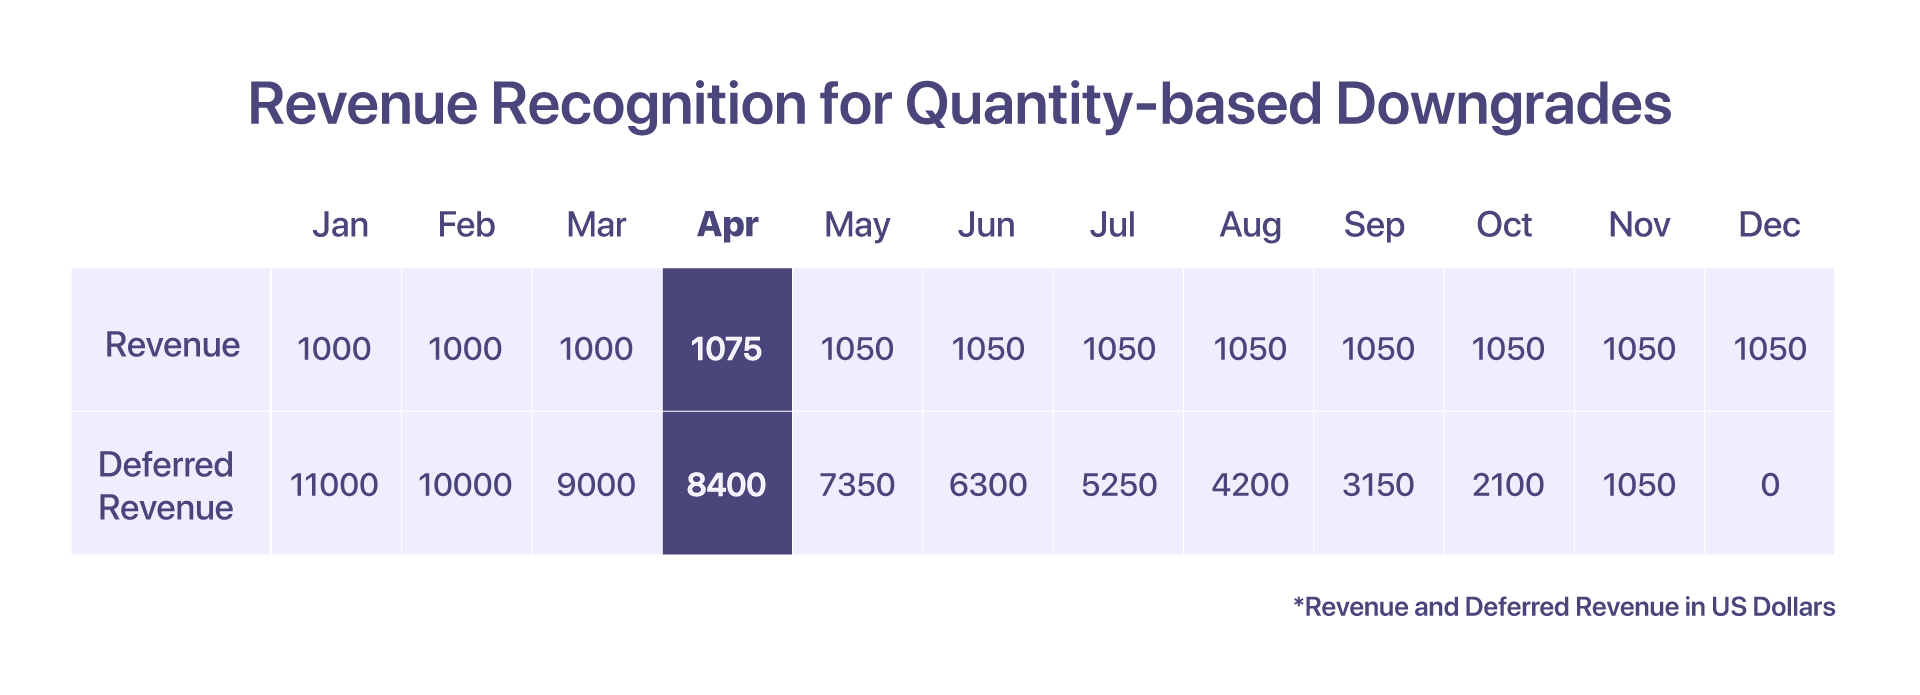 revenue recognition for quantity-based downgrades